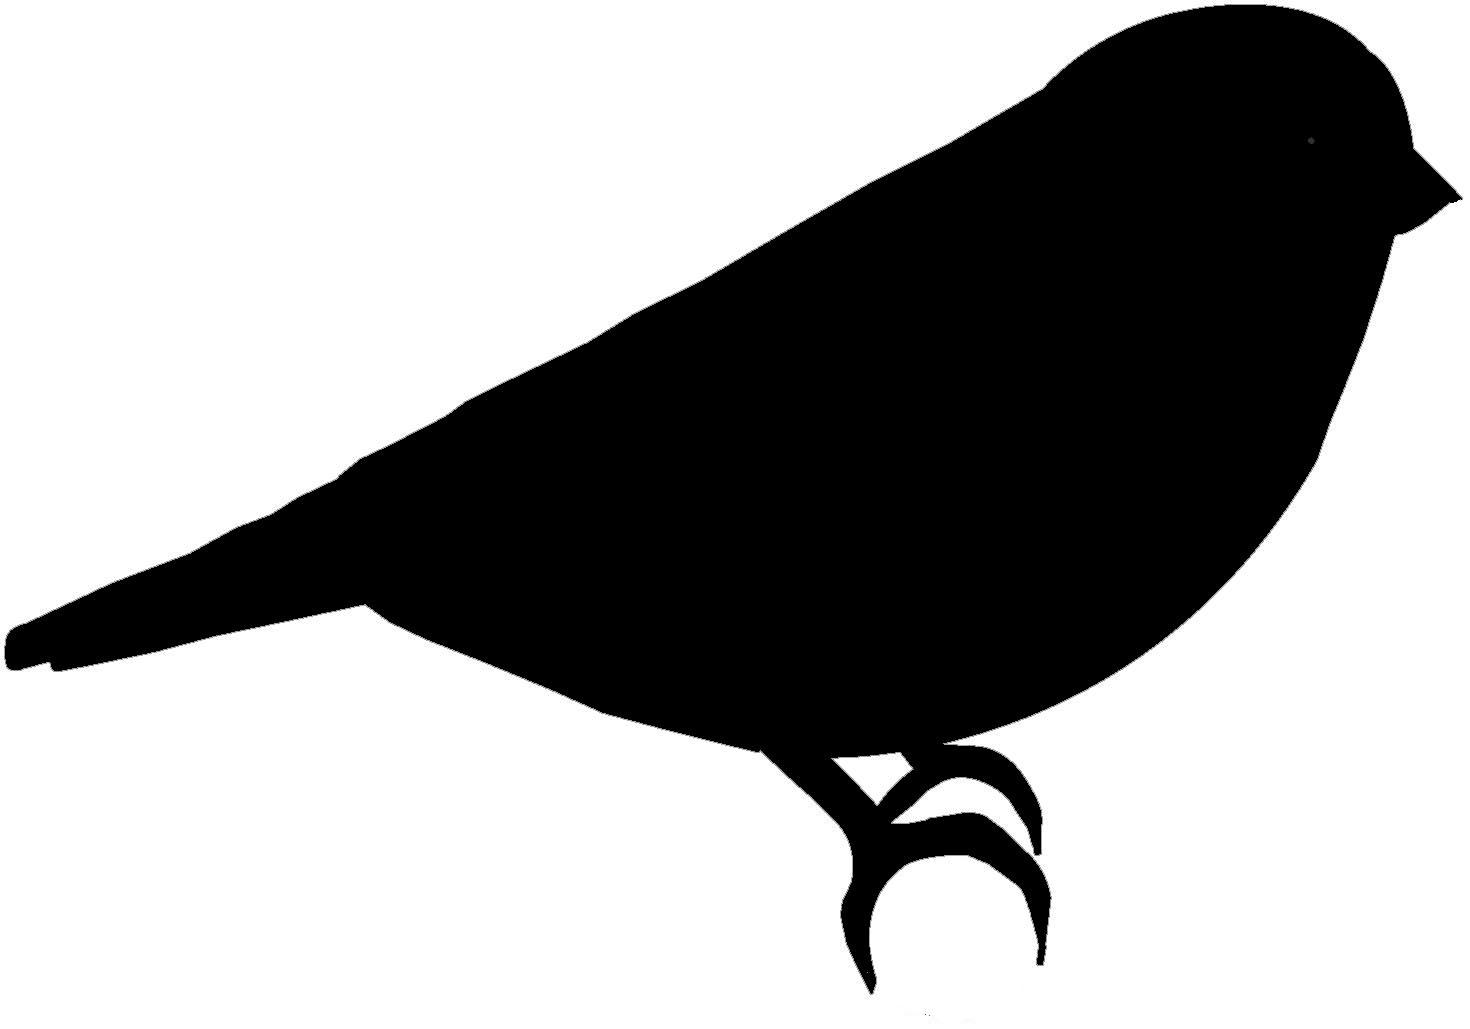 1470x1029 Bird Outline Clip Art